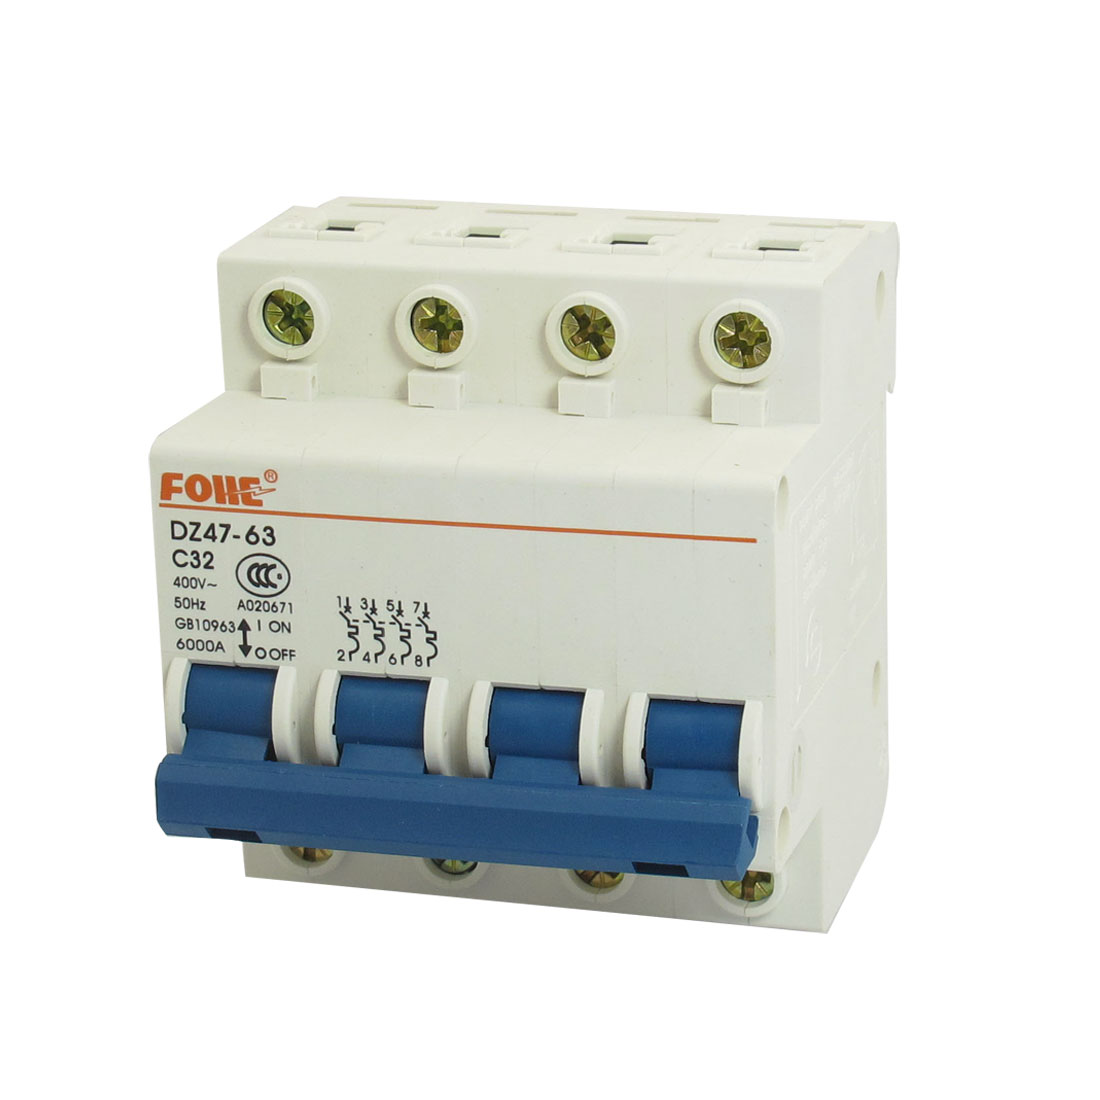 DZ47-63 C32 4P DIN Rail Mounted MCB Miniature Circuit Breaker 6000A 32A 400V AC